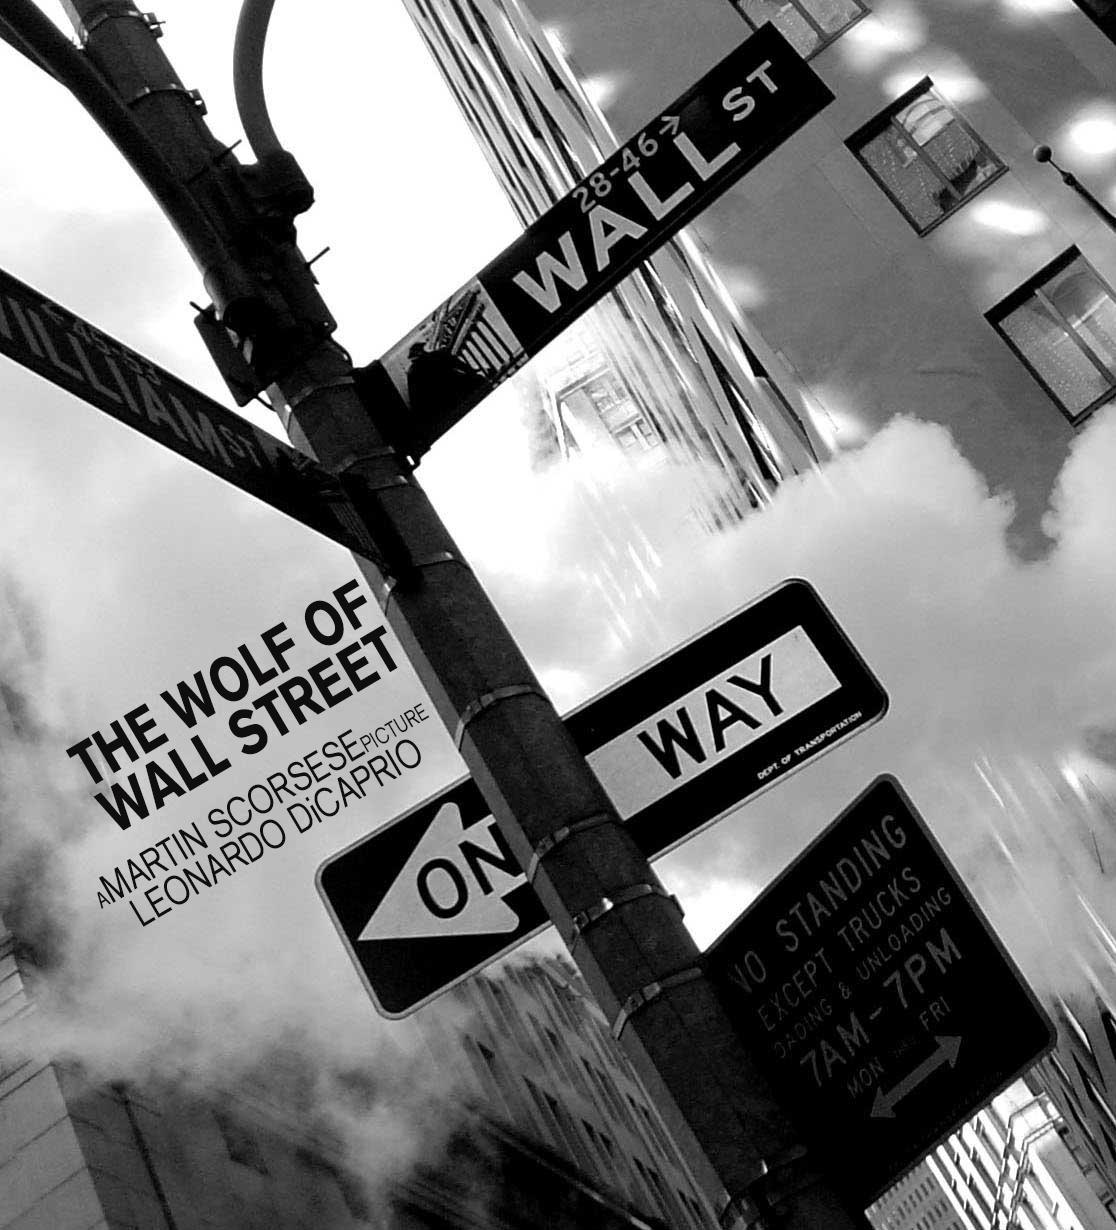 Wall Street 201820 Hd Wallpaper Backgrounds Download